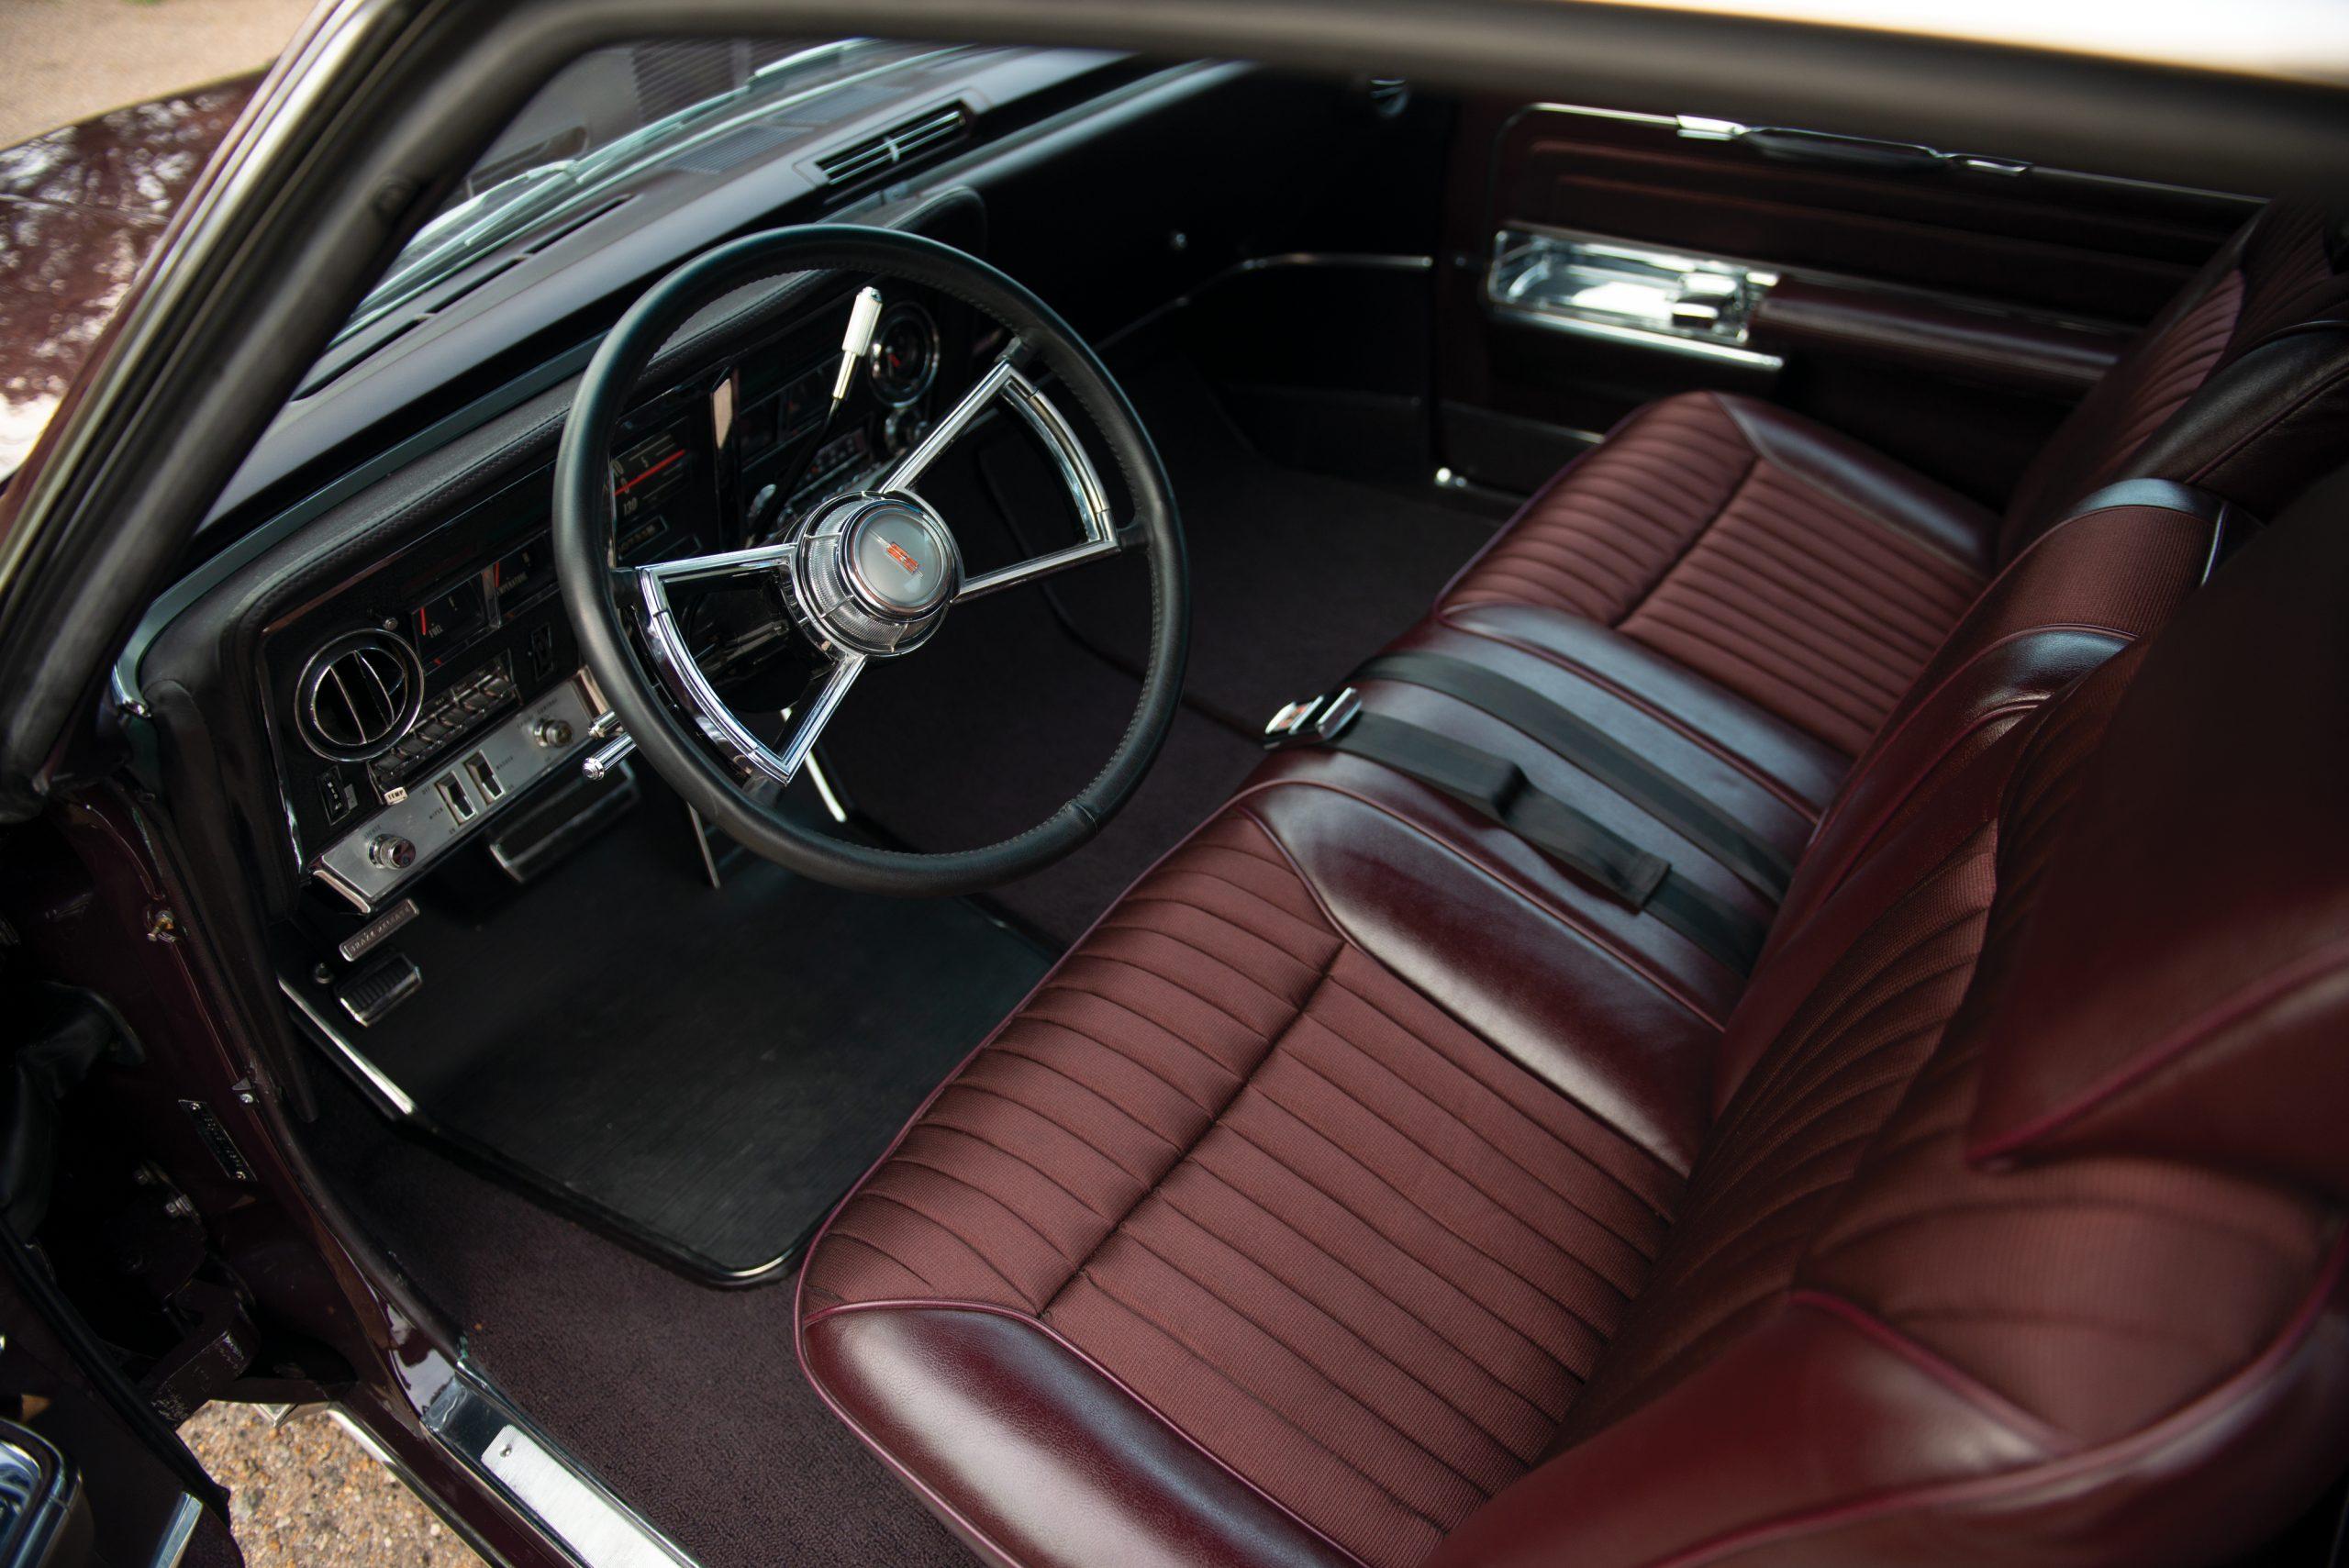 Olds Toronado interior front